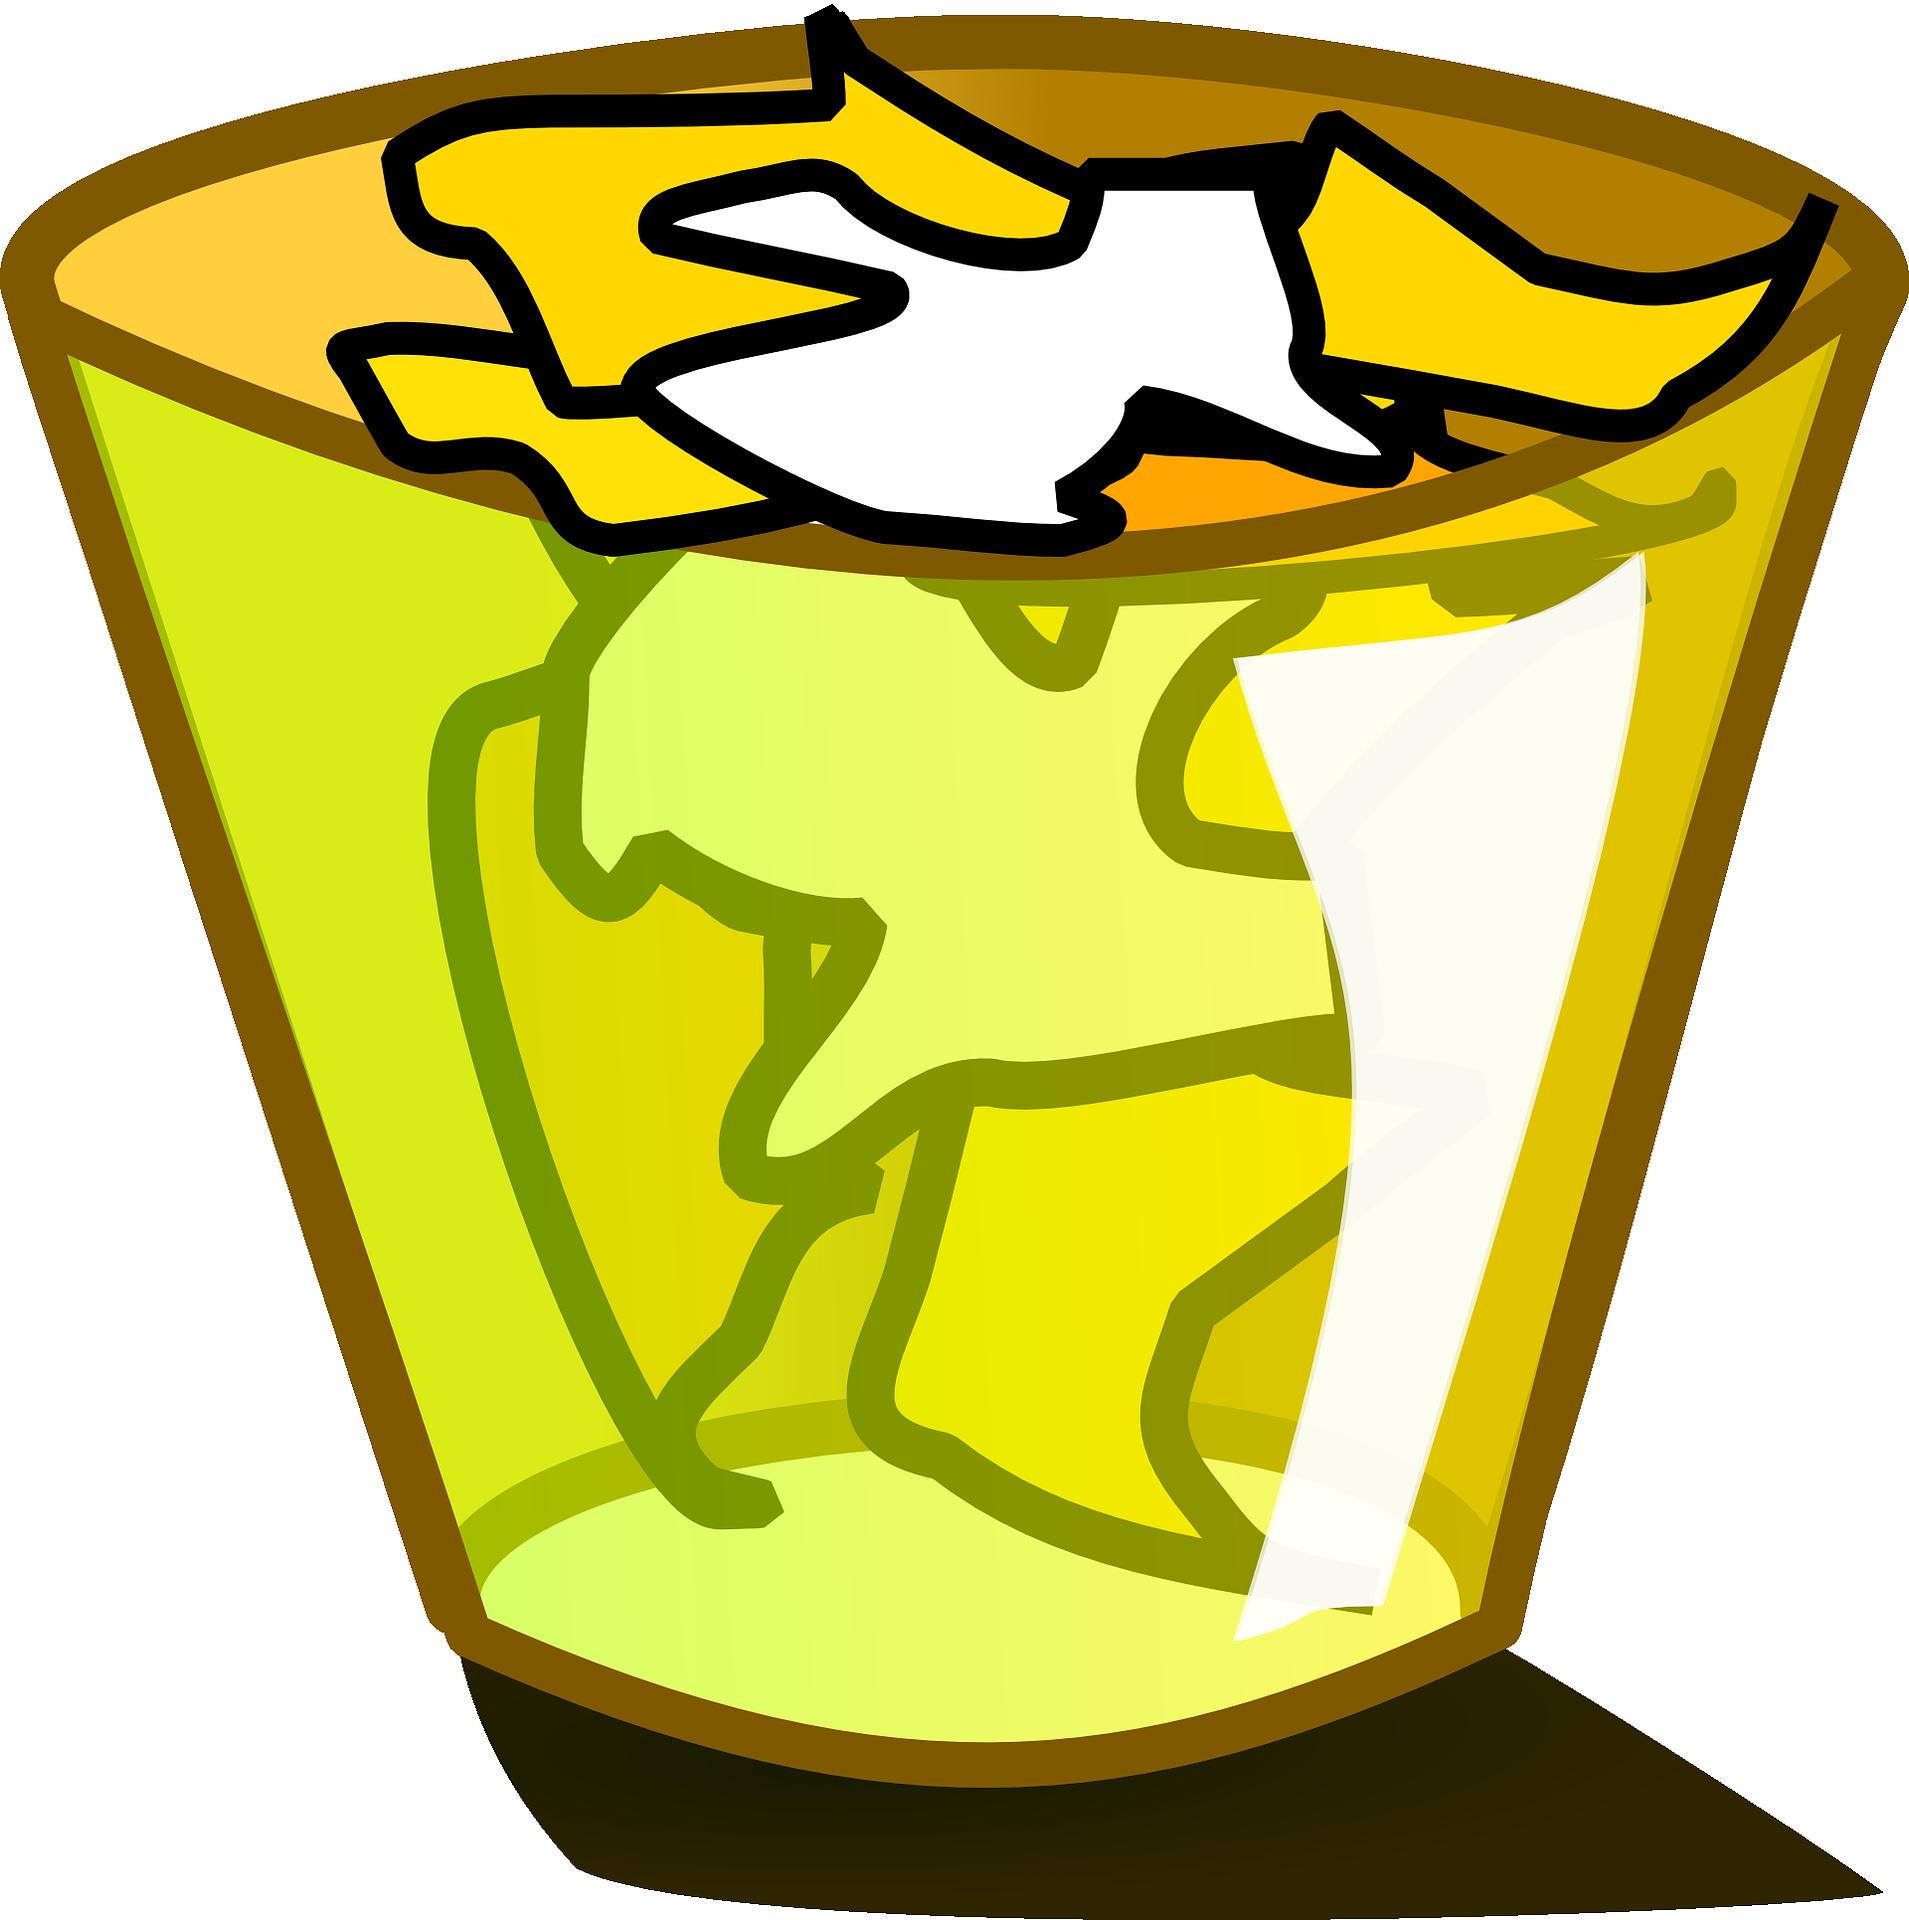 Rubbish bins paper baskets. Clipart apples waste